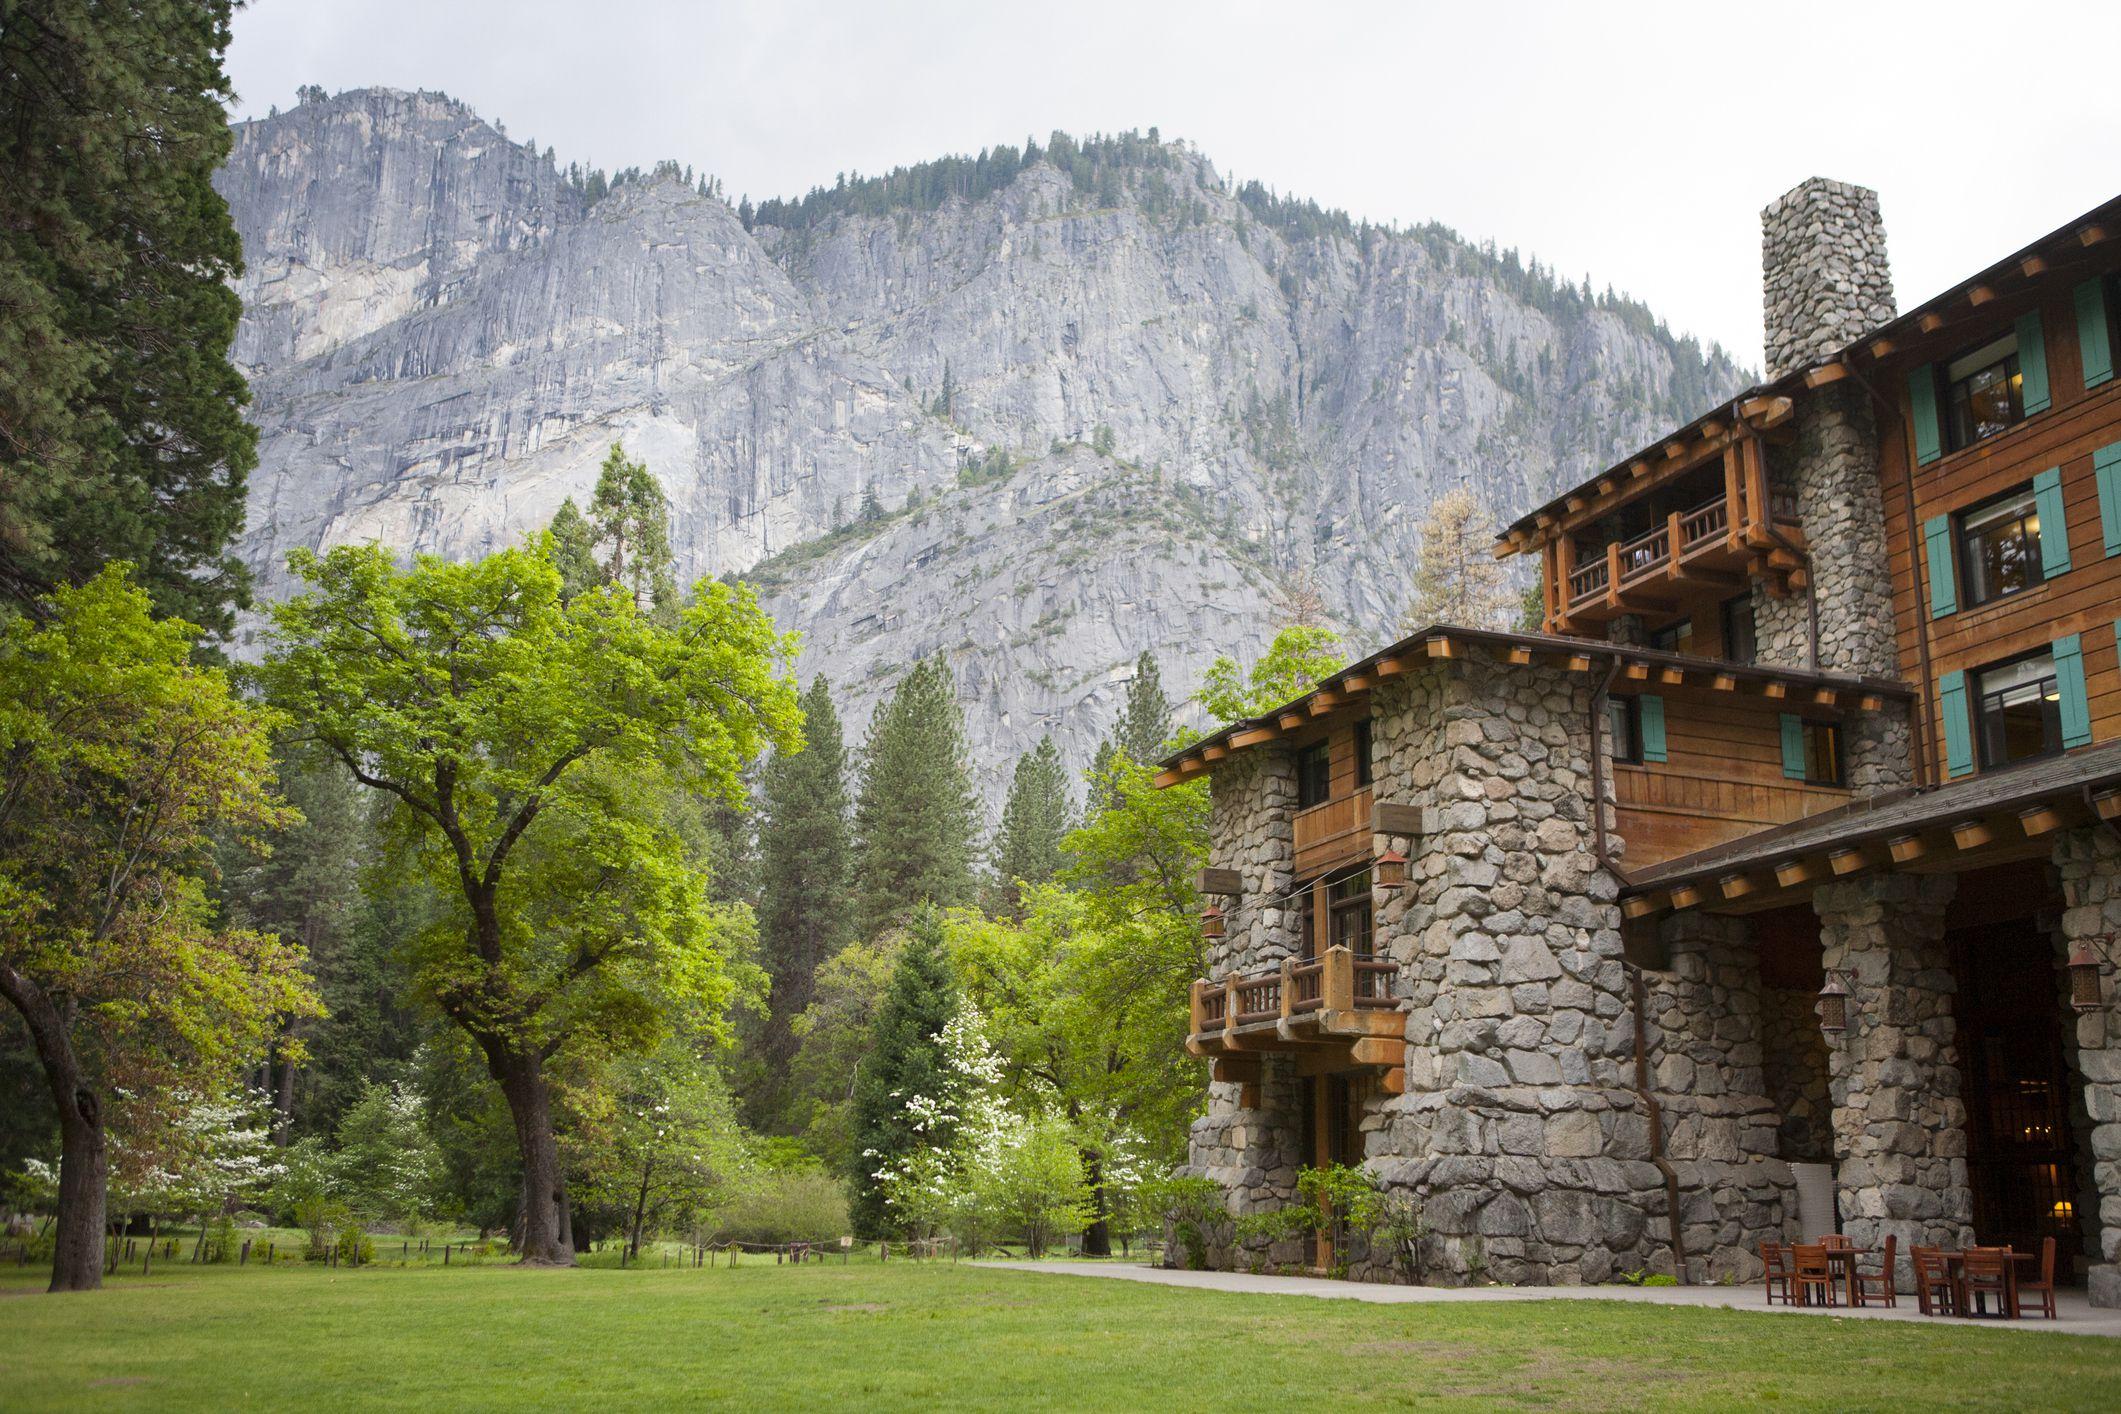 The 9 Best Hotels Near Yosemite National Park in 2019 Yosemite Map Of Hampton Inns on